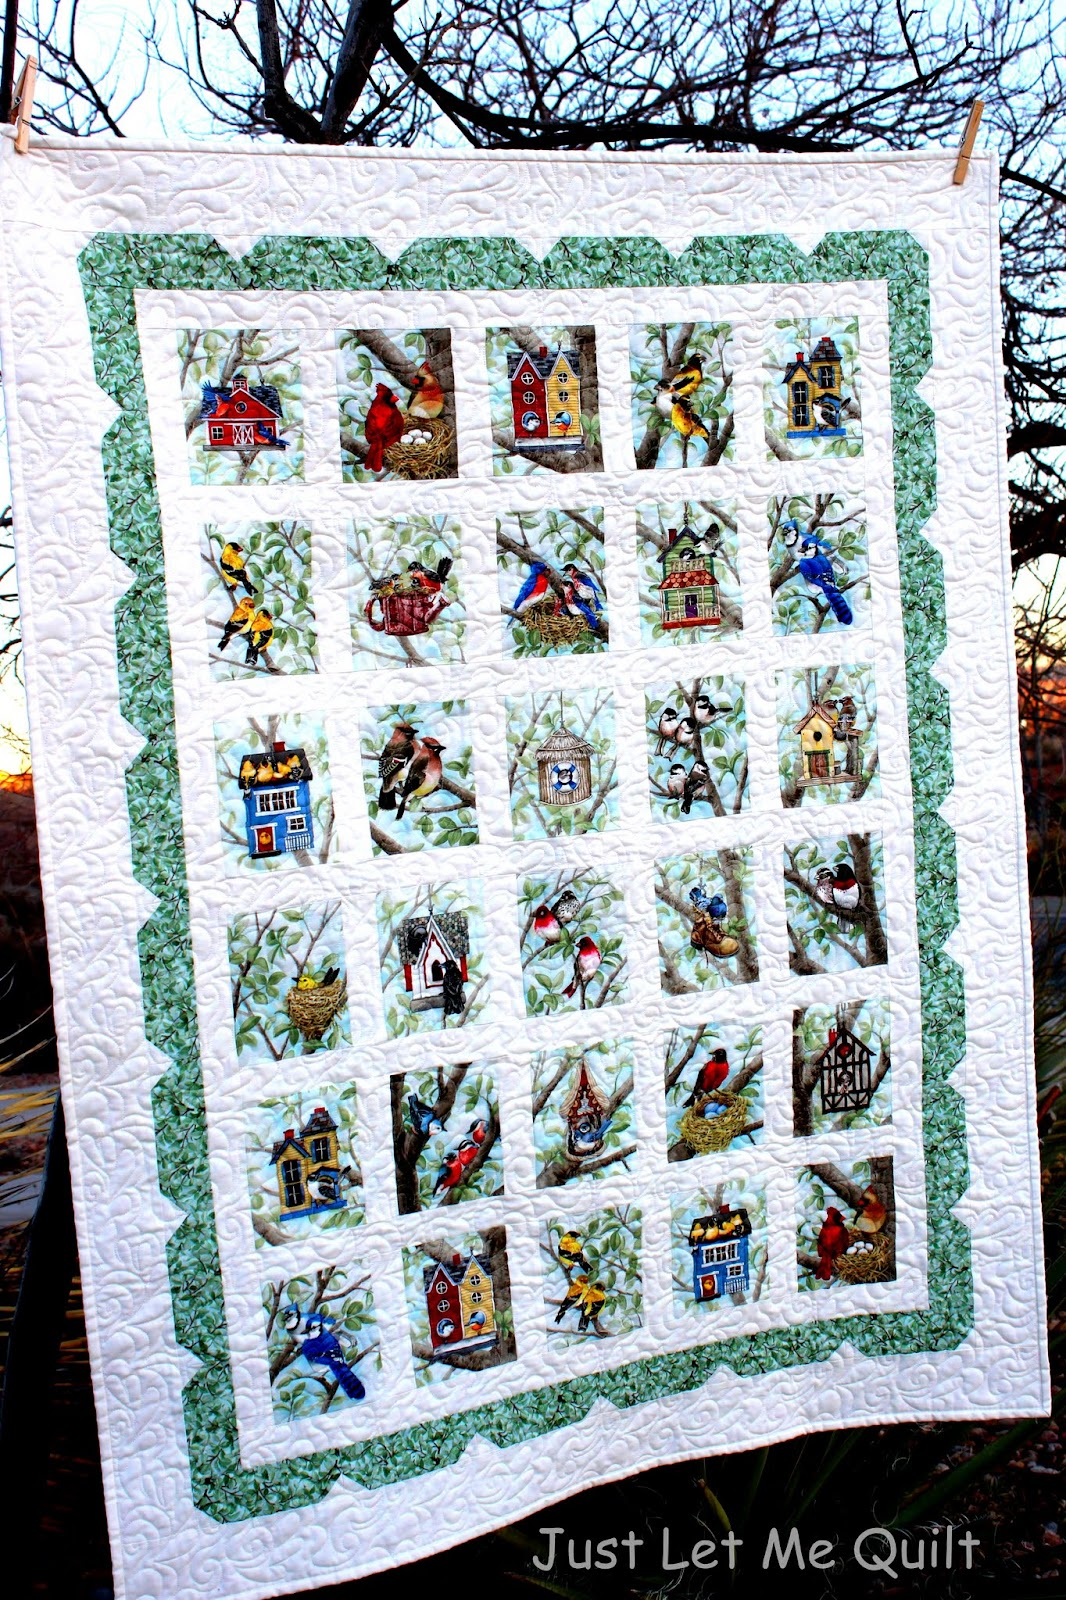 Bird Fabric Panel The Panels of Birds And